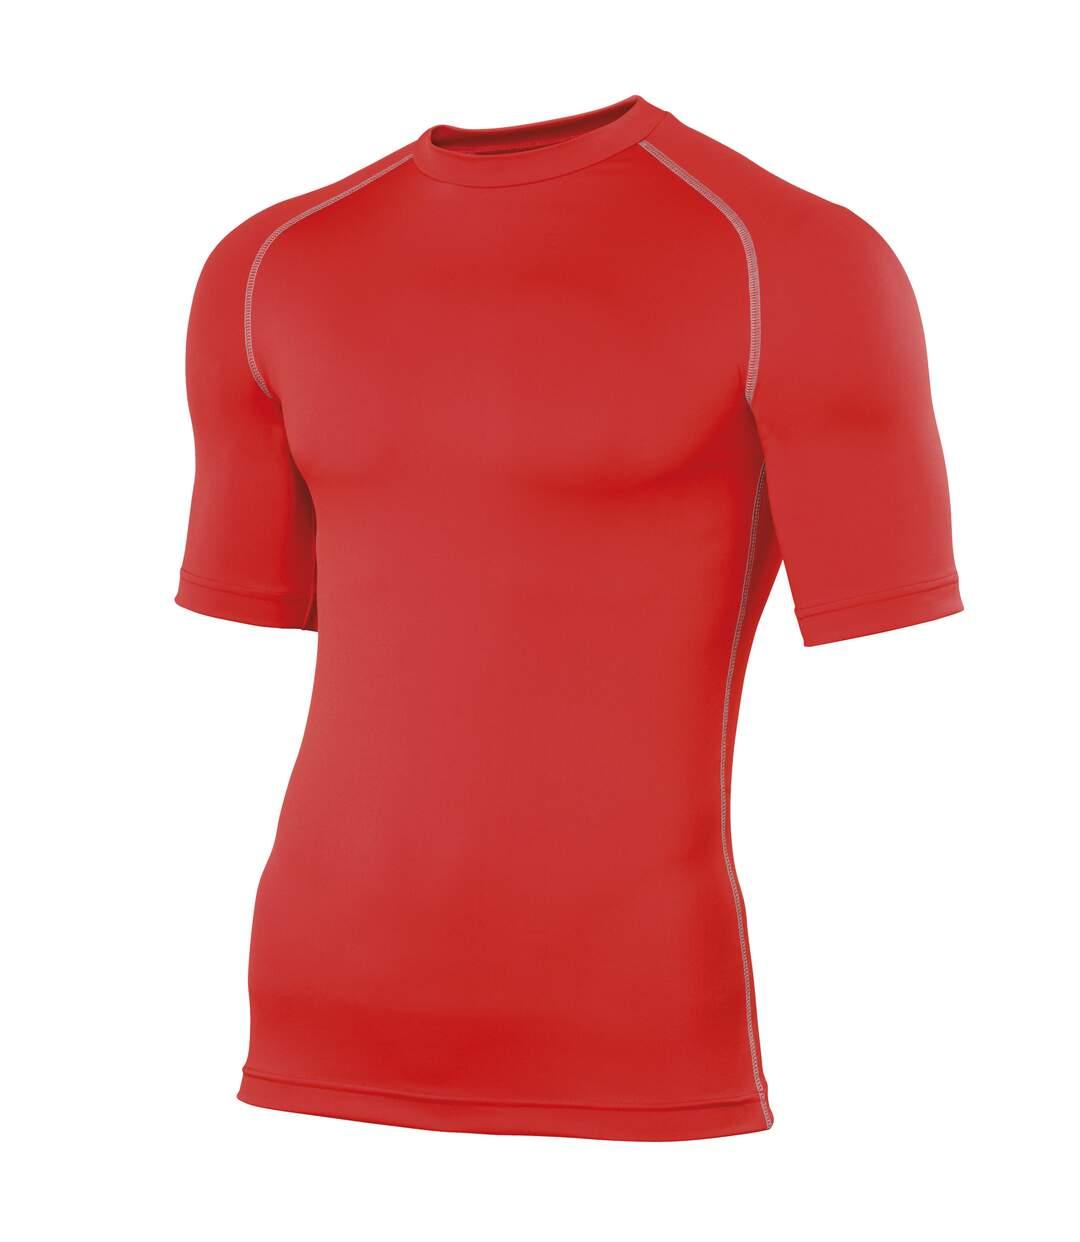 Rhino Mens Sports Base Layer Short Sleeve T-Shirt (Red) - UTRW1277